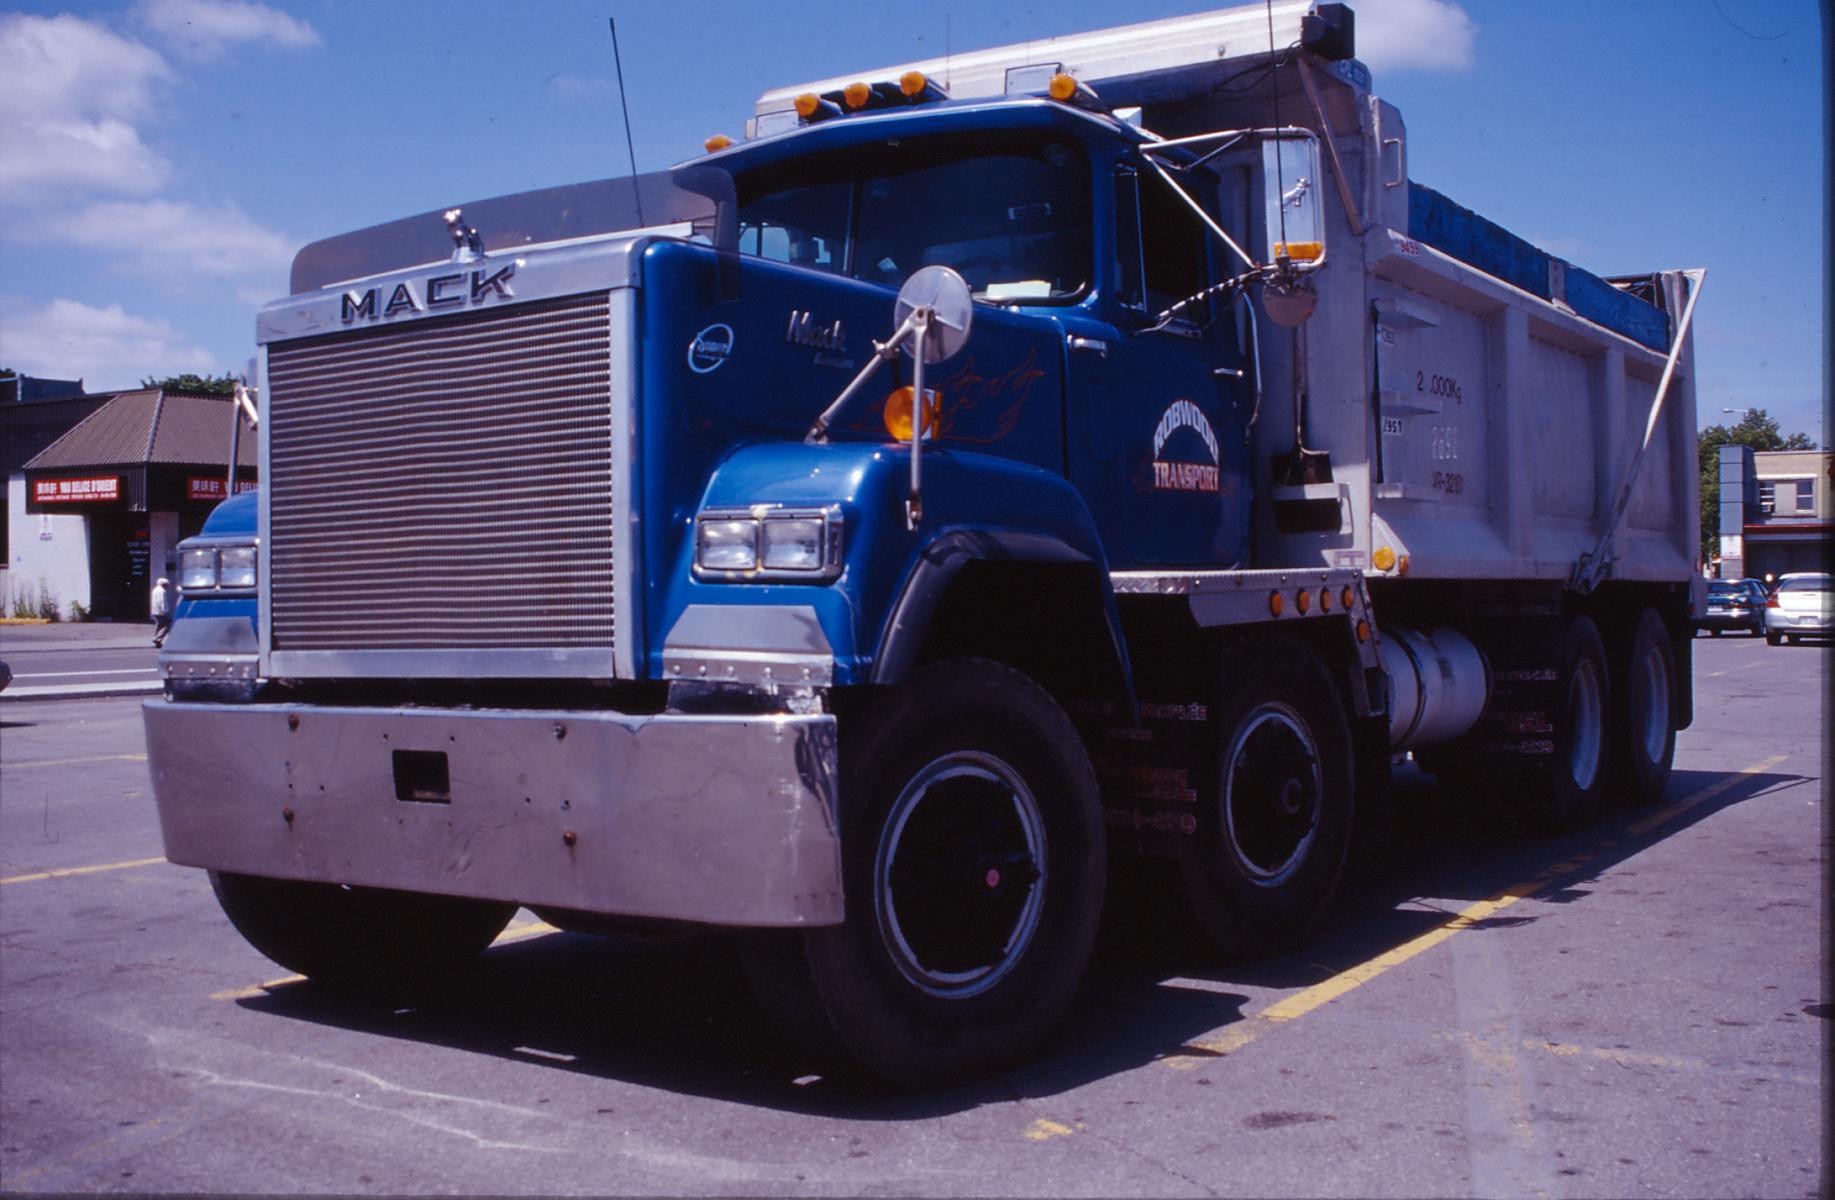 File:1987 Mack dump truck in Montreal Canada.JPG - Wikimedia Commons